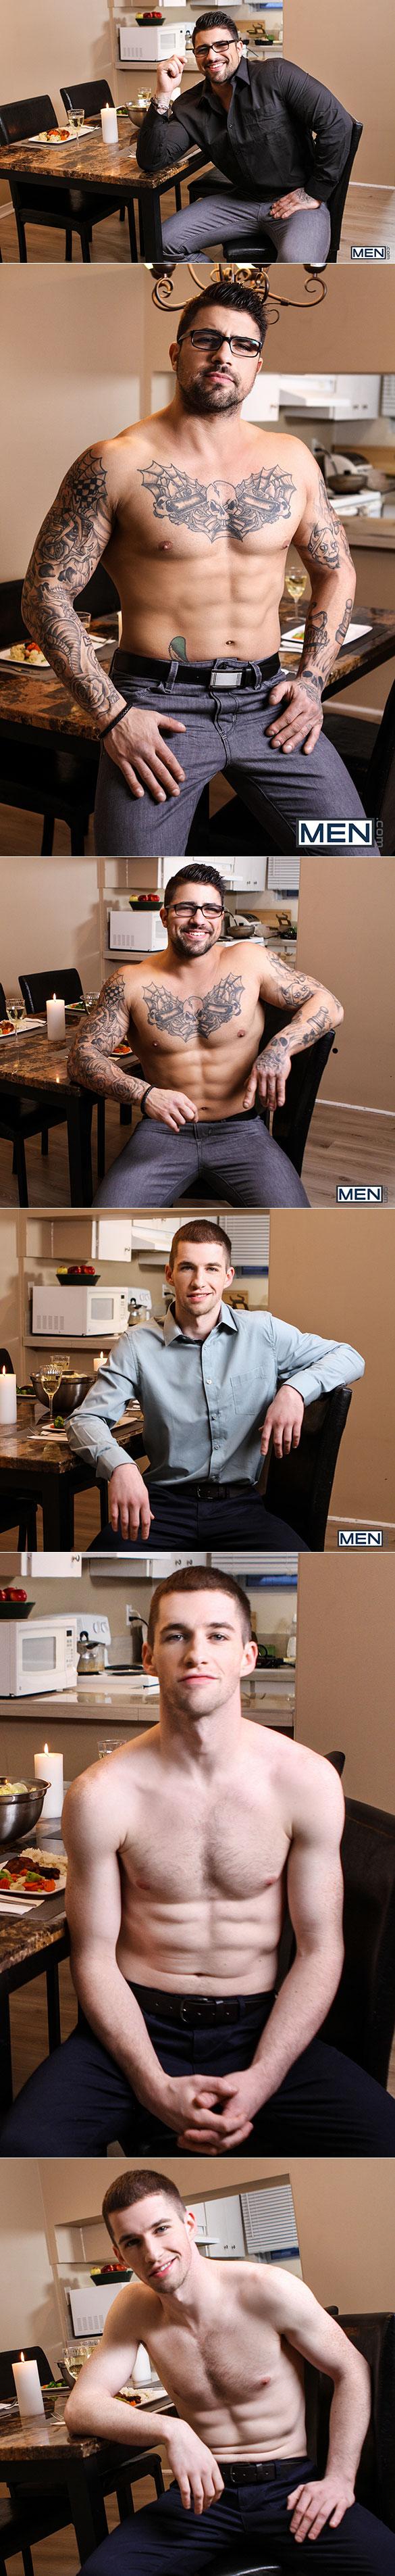 "Men.com: Thyle Knoxx rides Ryan Bones' thick cock in ""Ass Controller, Part 3"""